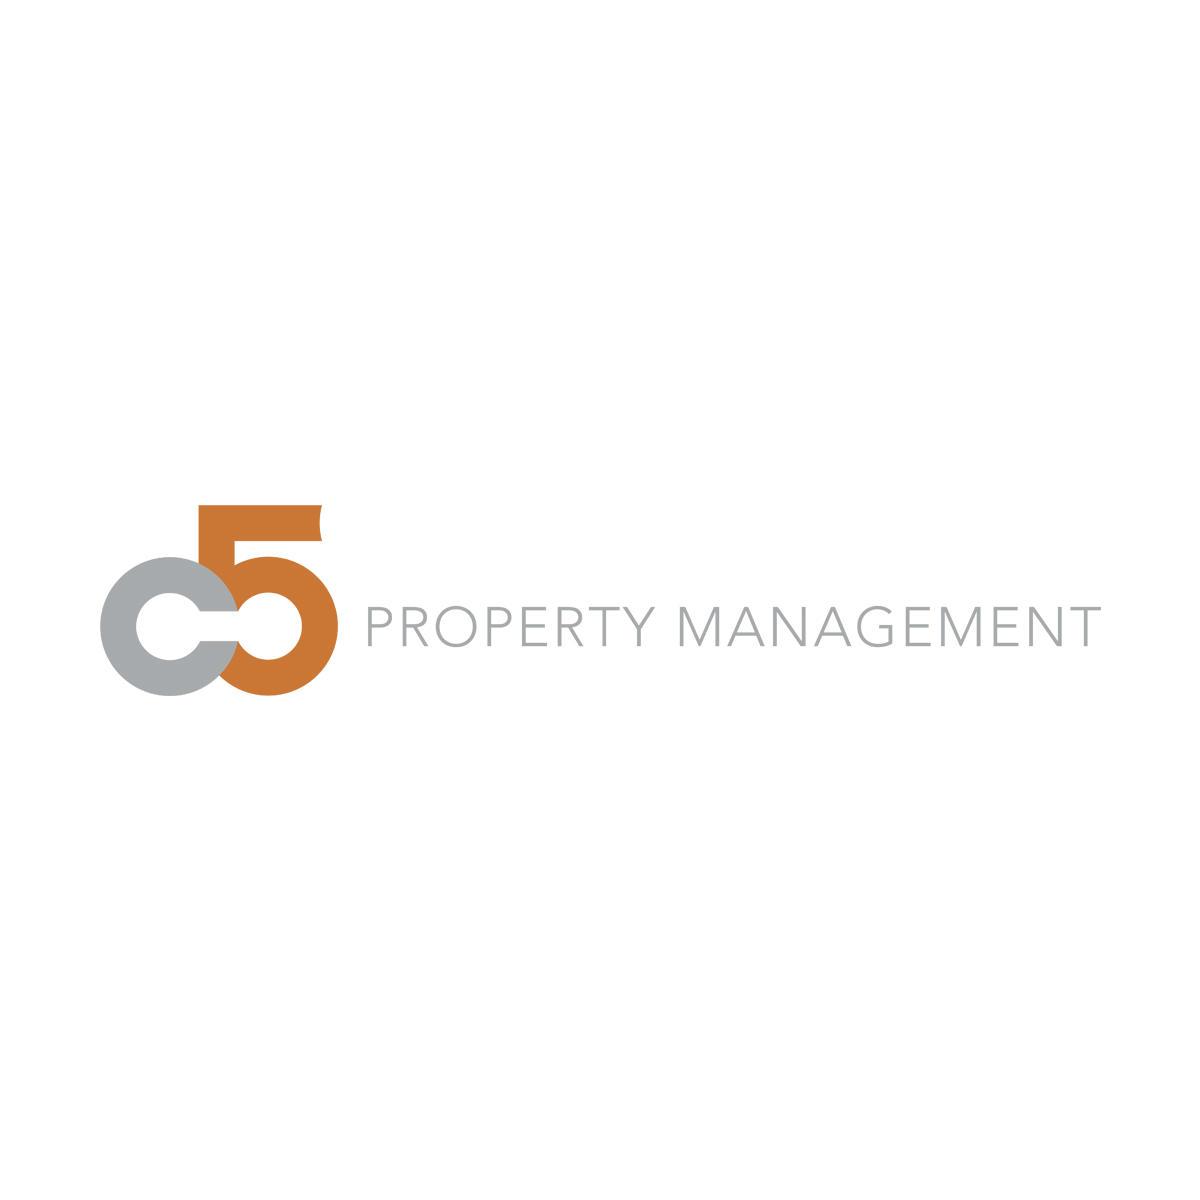 C5 Property Management